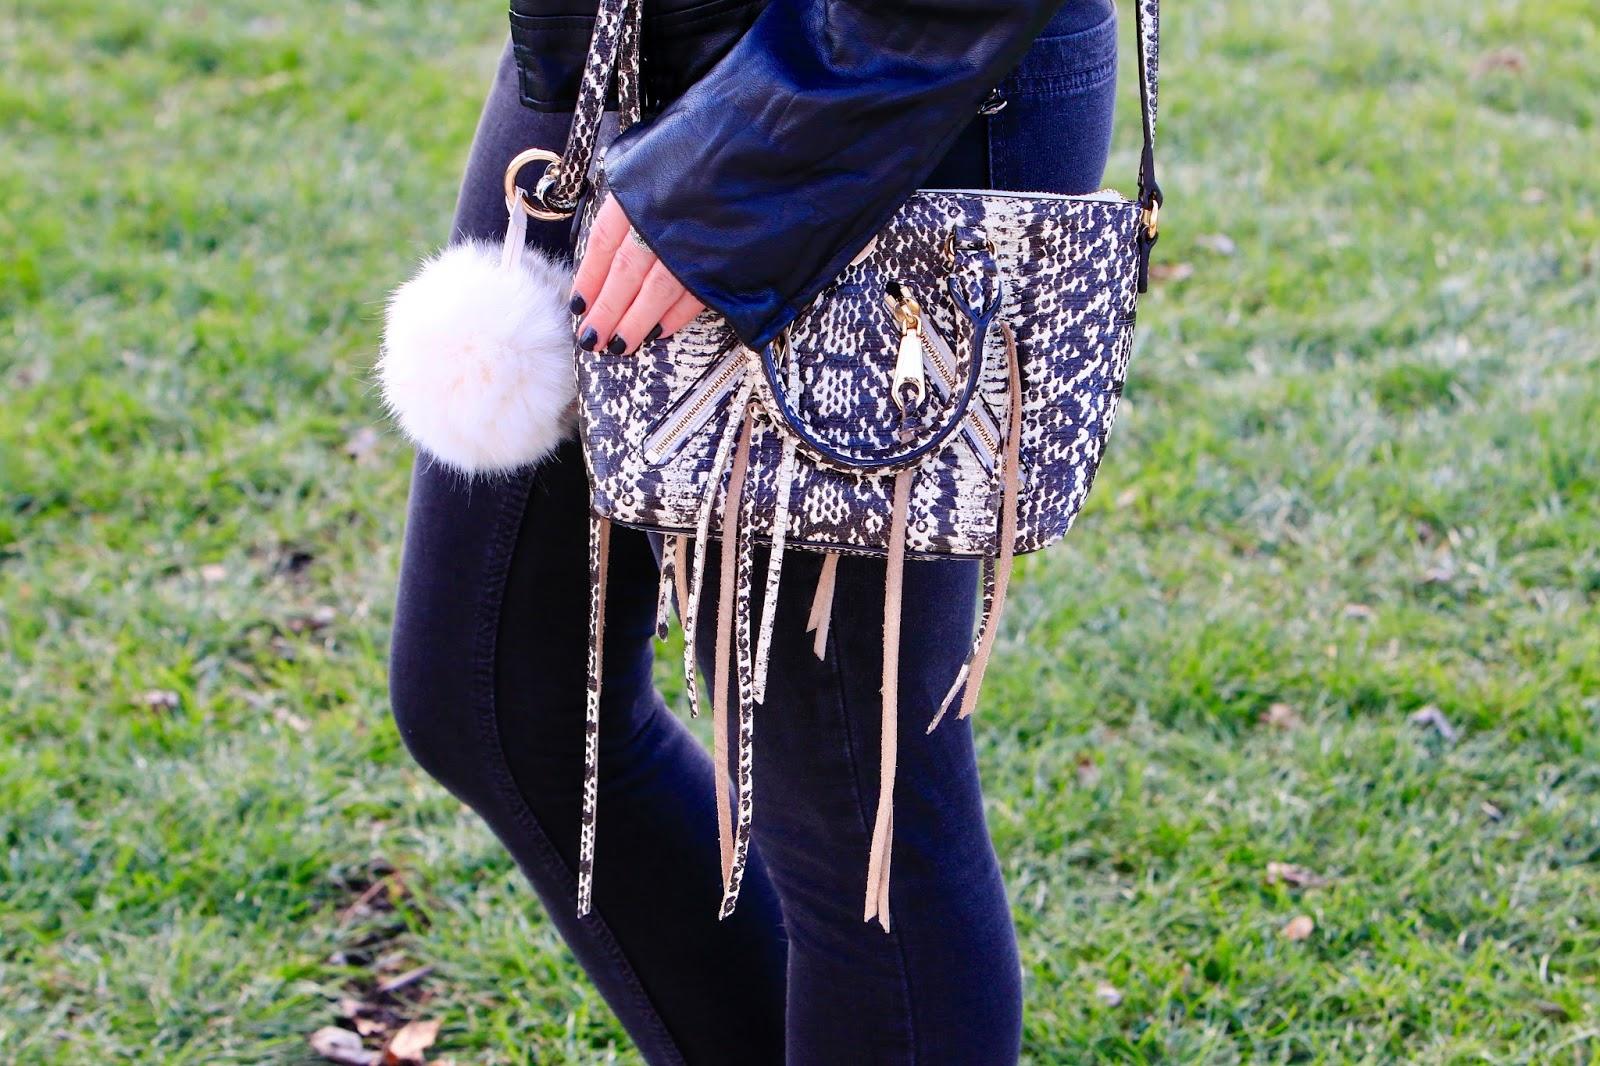 snakeskin rebecca minkoff purse